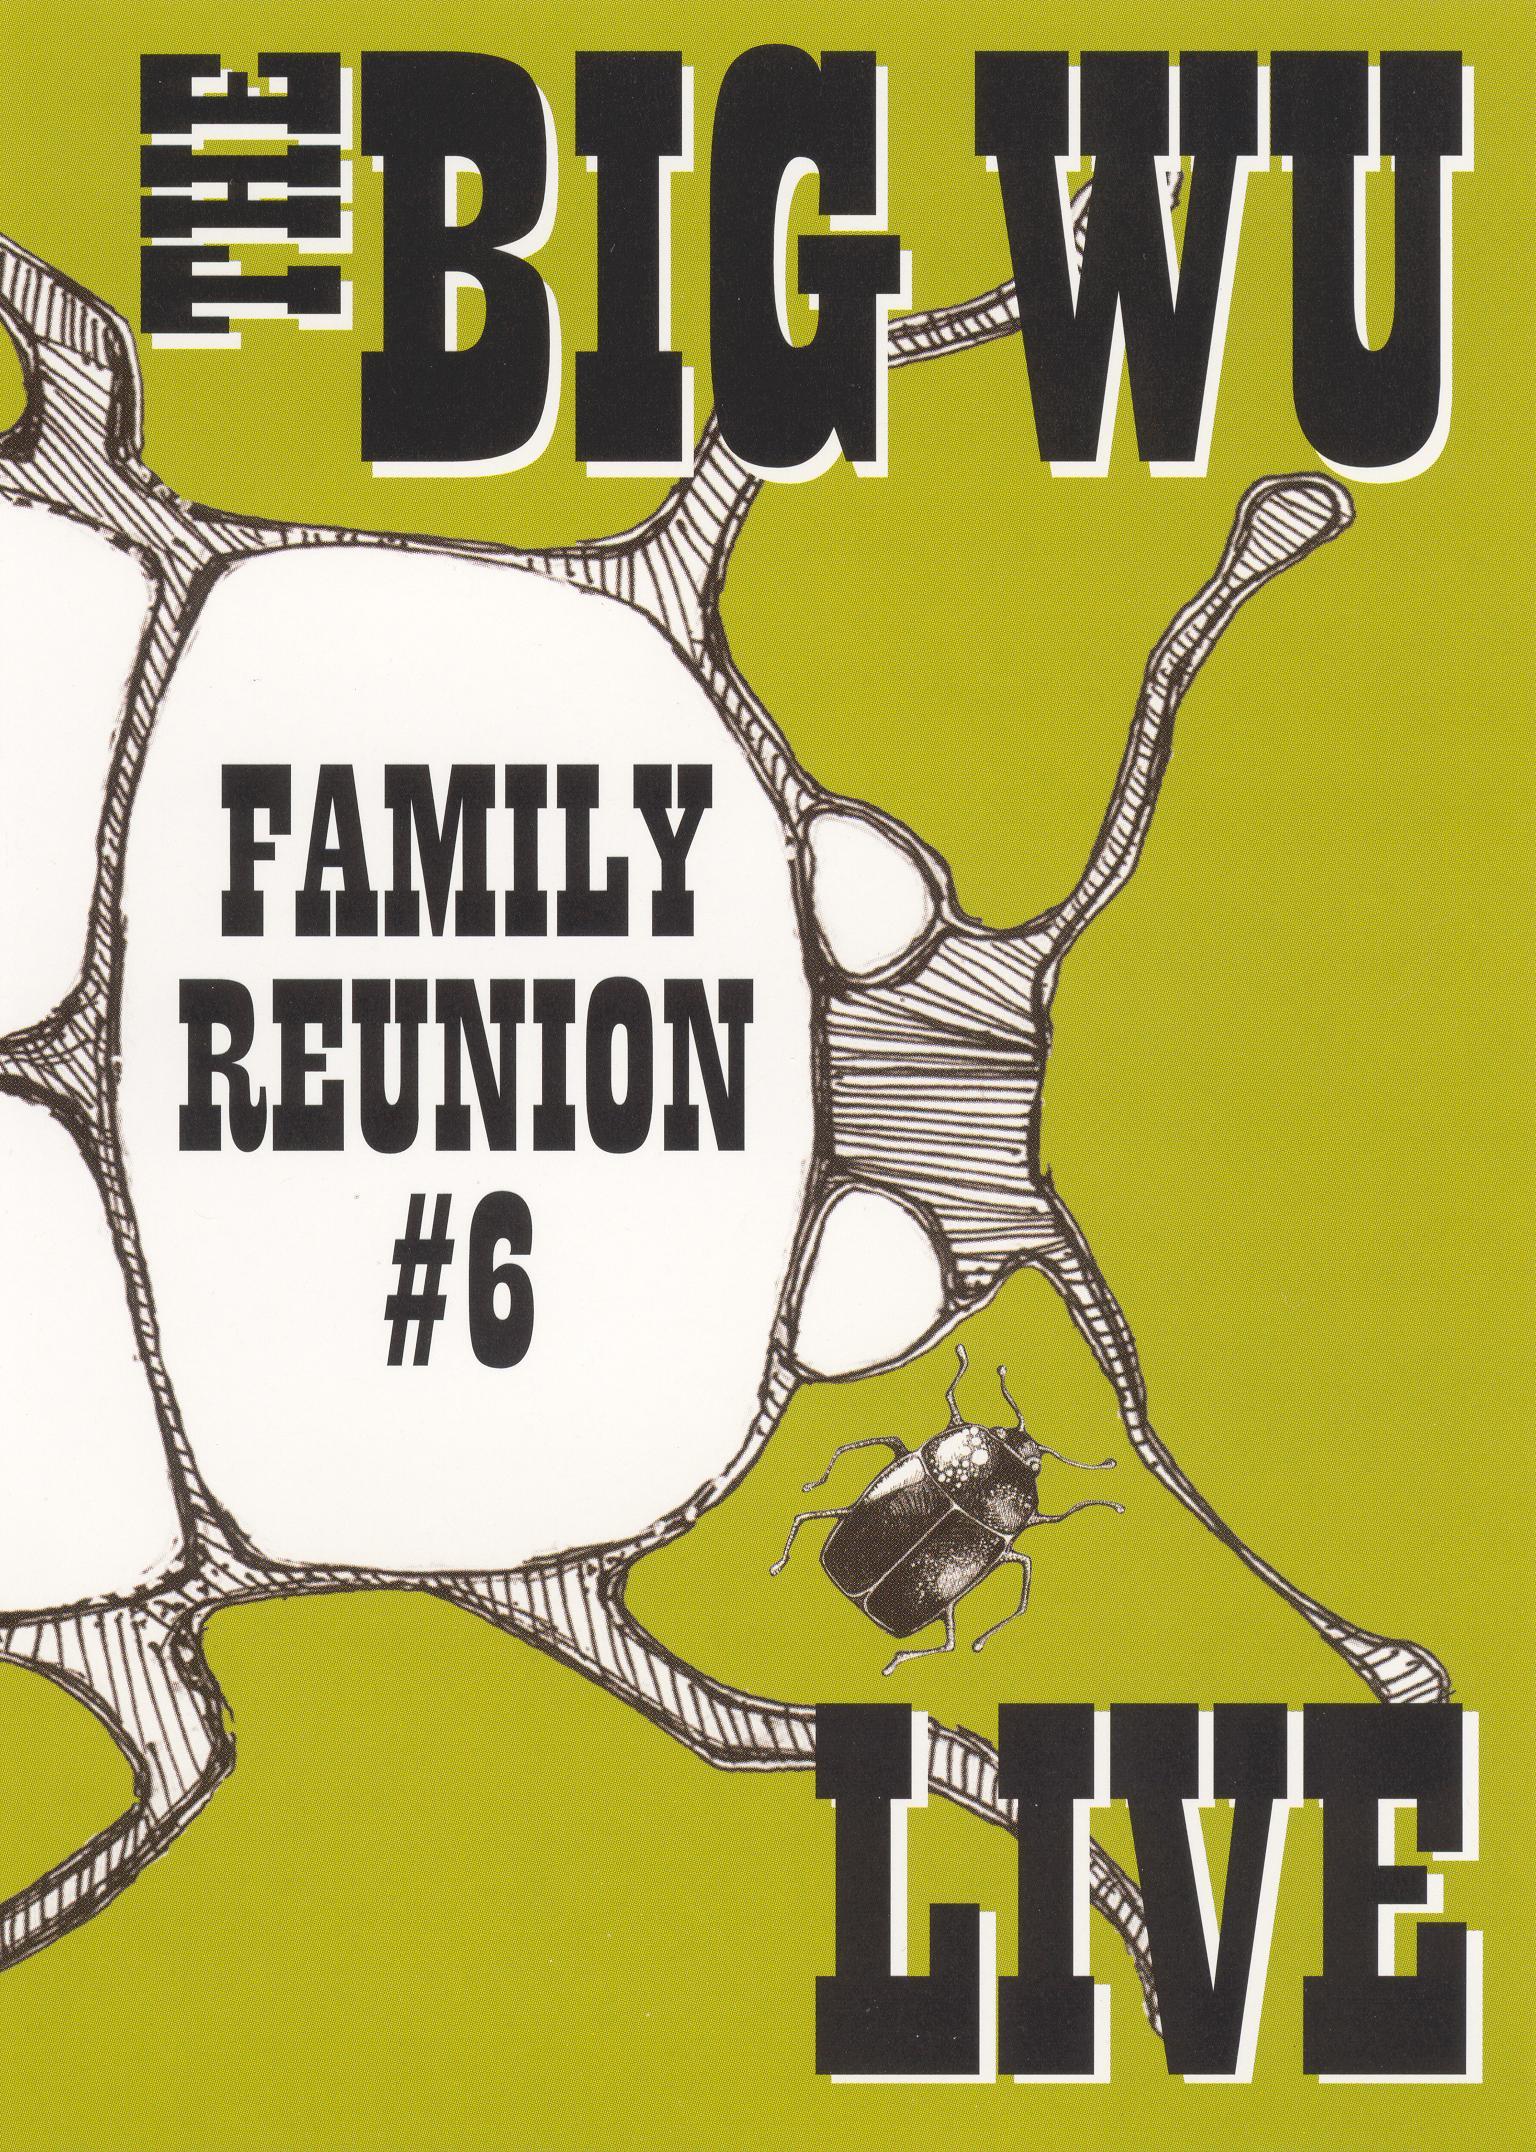 The Big Wu: Family Reunion 6 Live